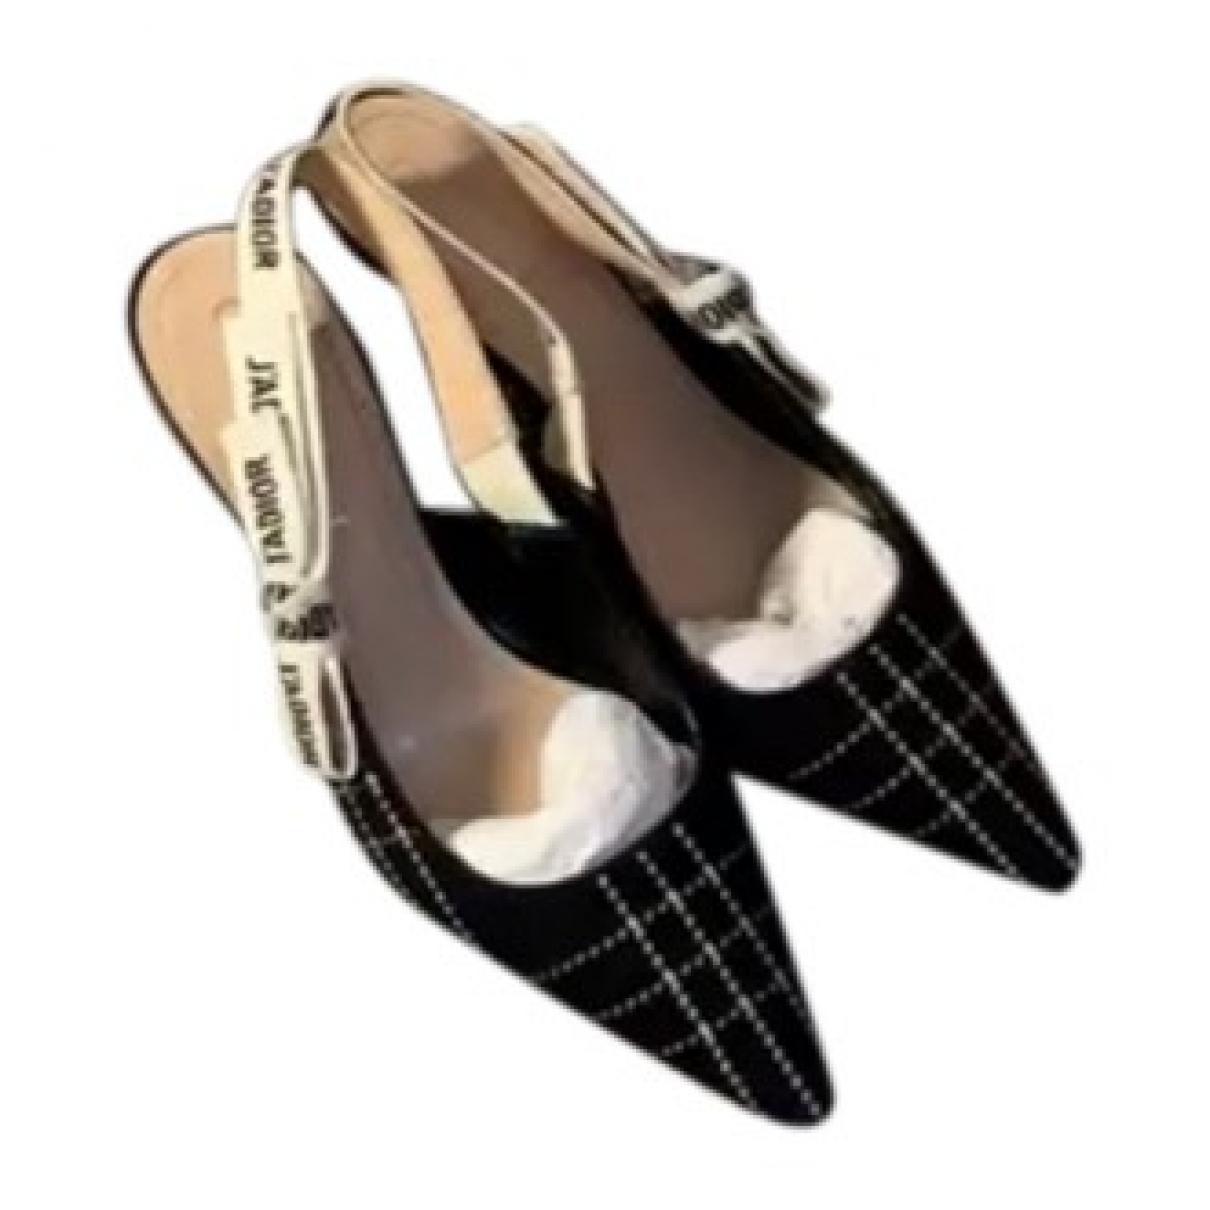 Tacones Jadior Tweed Dior